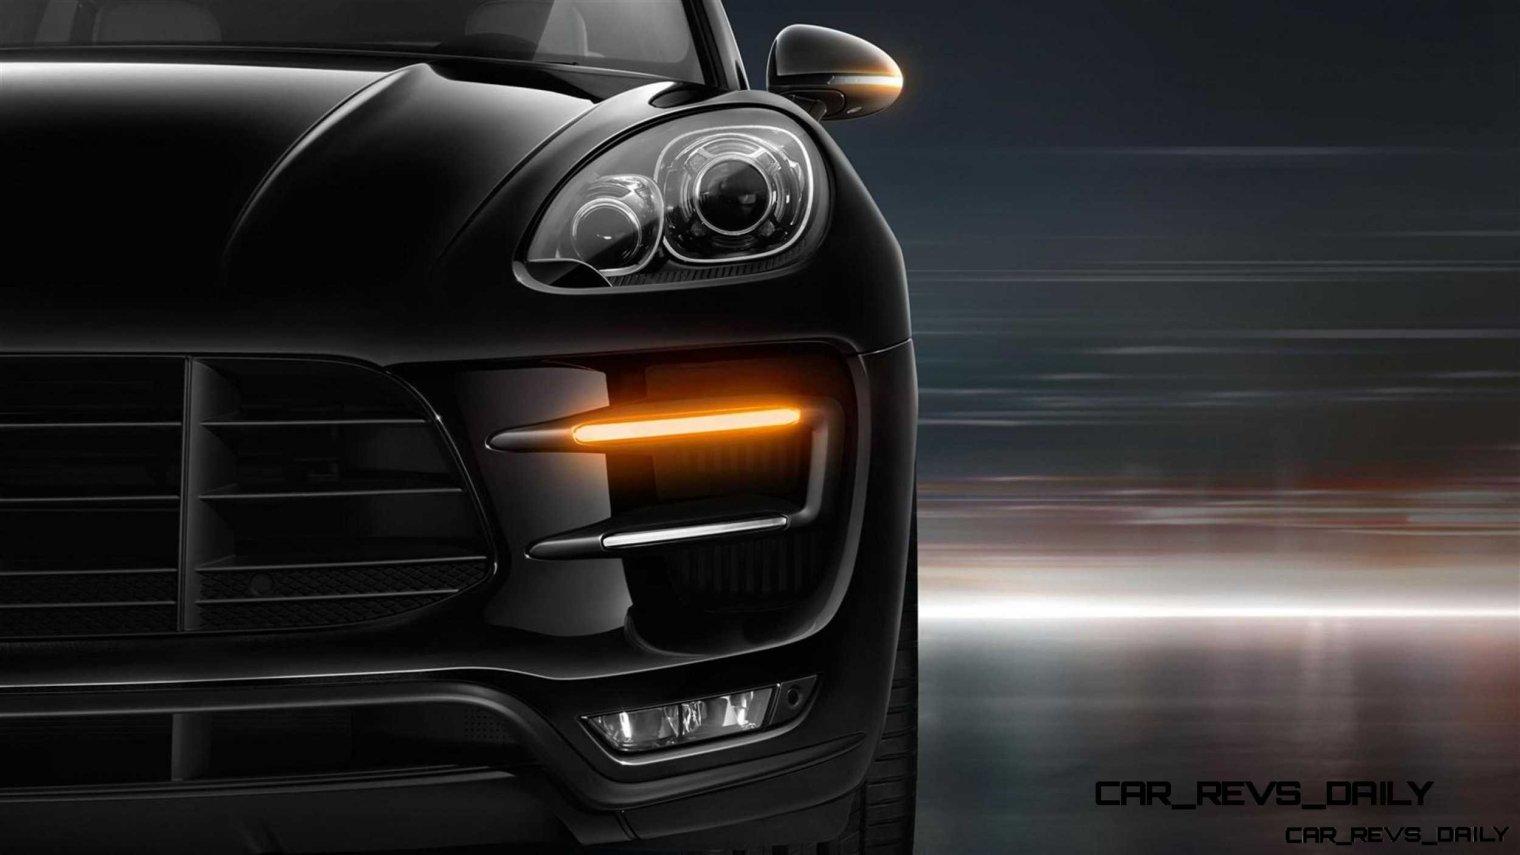 2015 Porsche Macan - Latest Images - CarRevsDaily.com 12